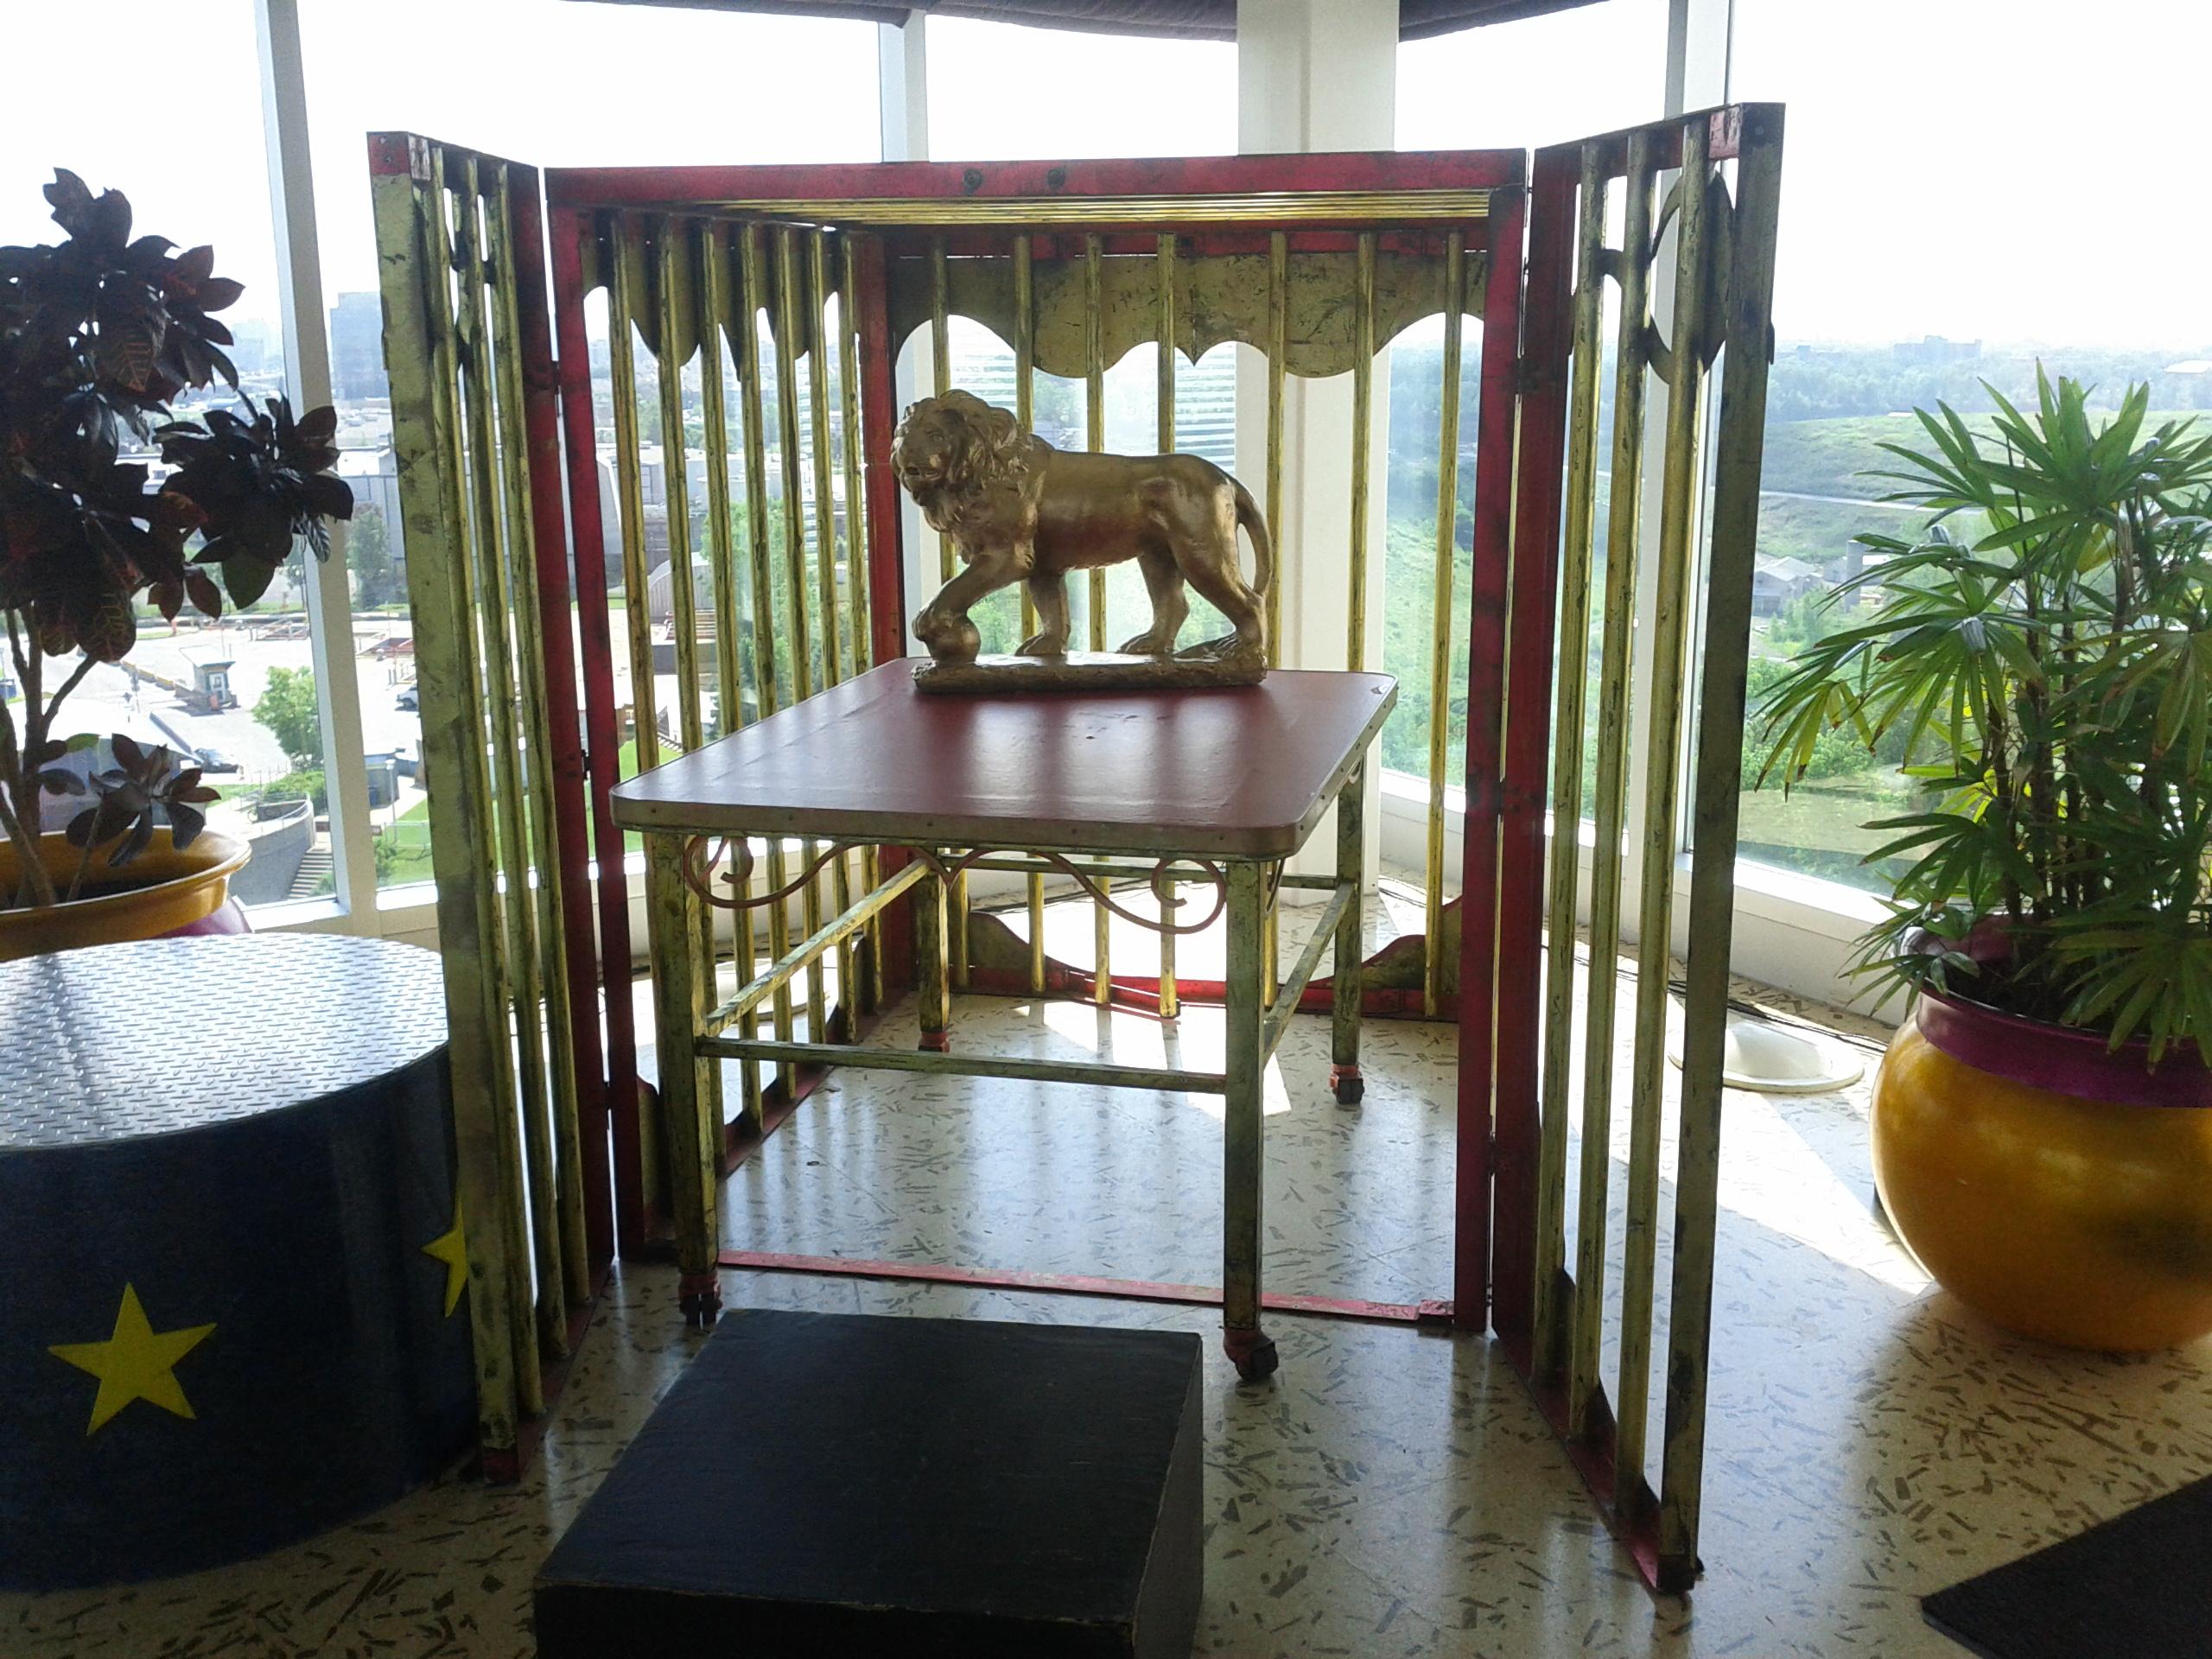 Cirque du Soleil headquarters top floor lion cage